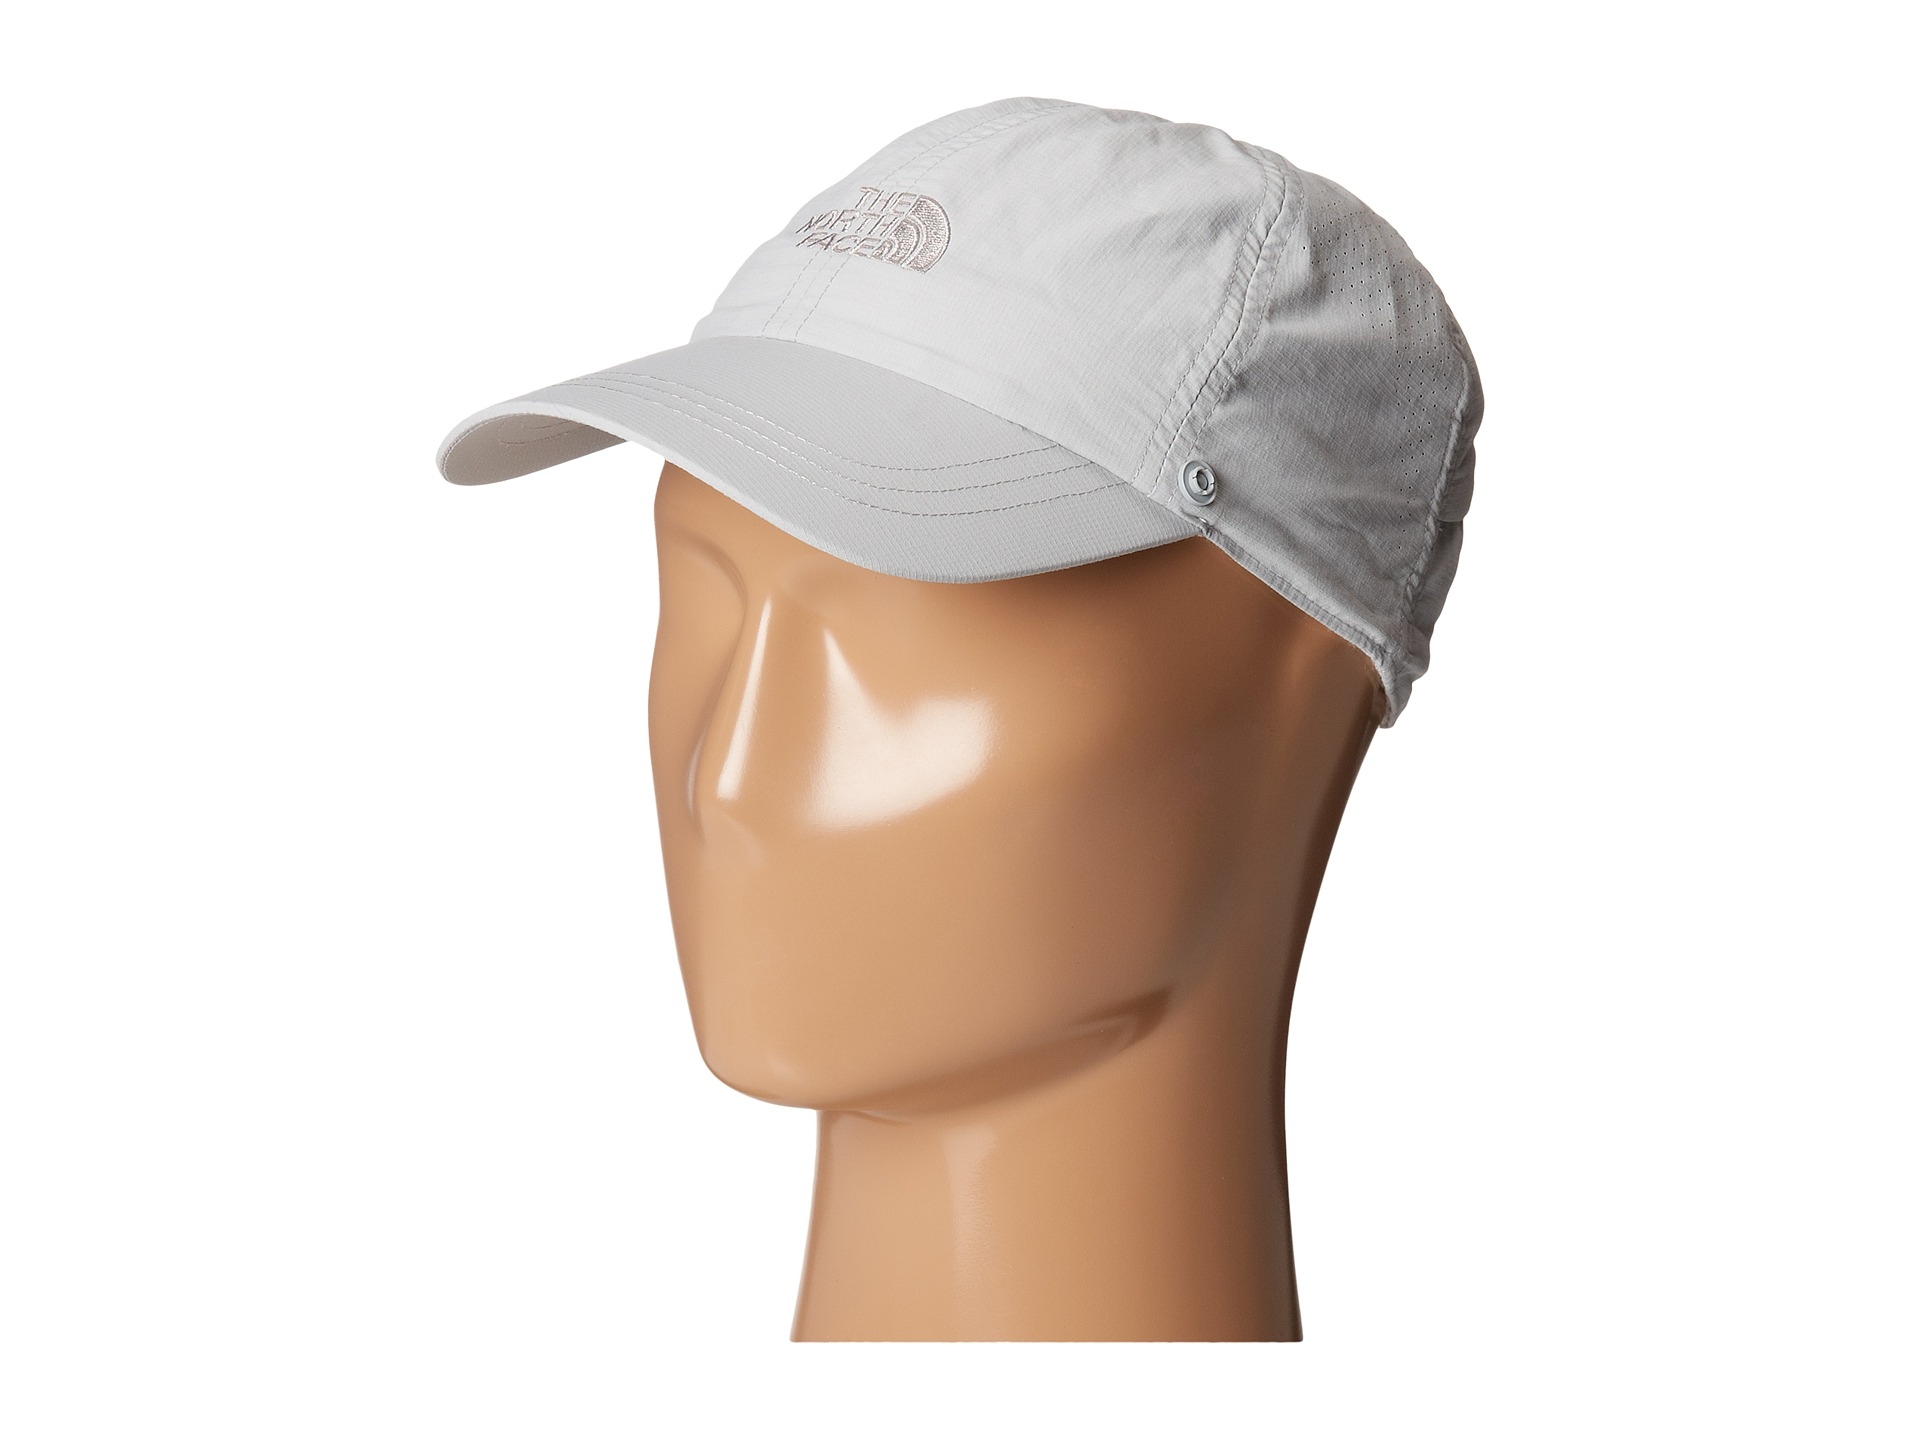 Face Shield Sun Protection >> The North Face Sun Shield Ball Cap in Gray - Lyst